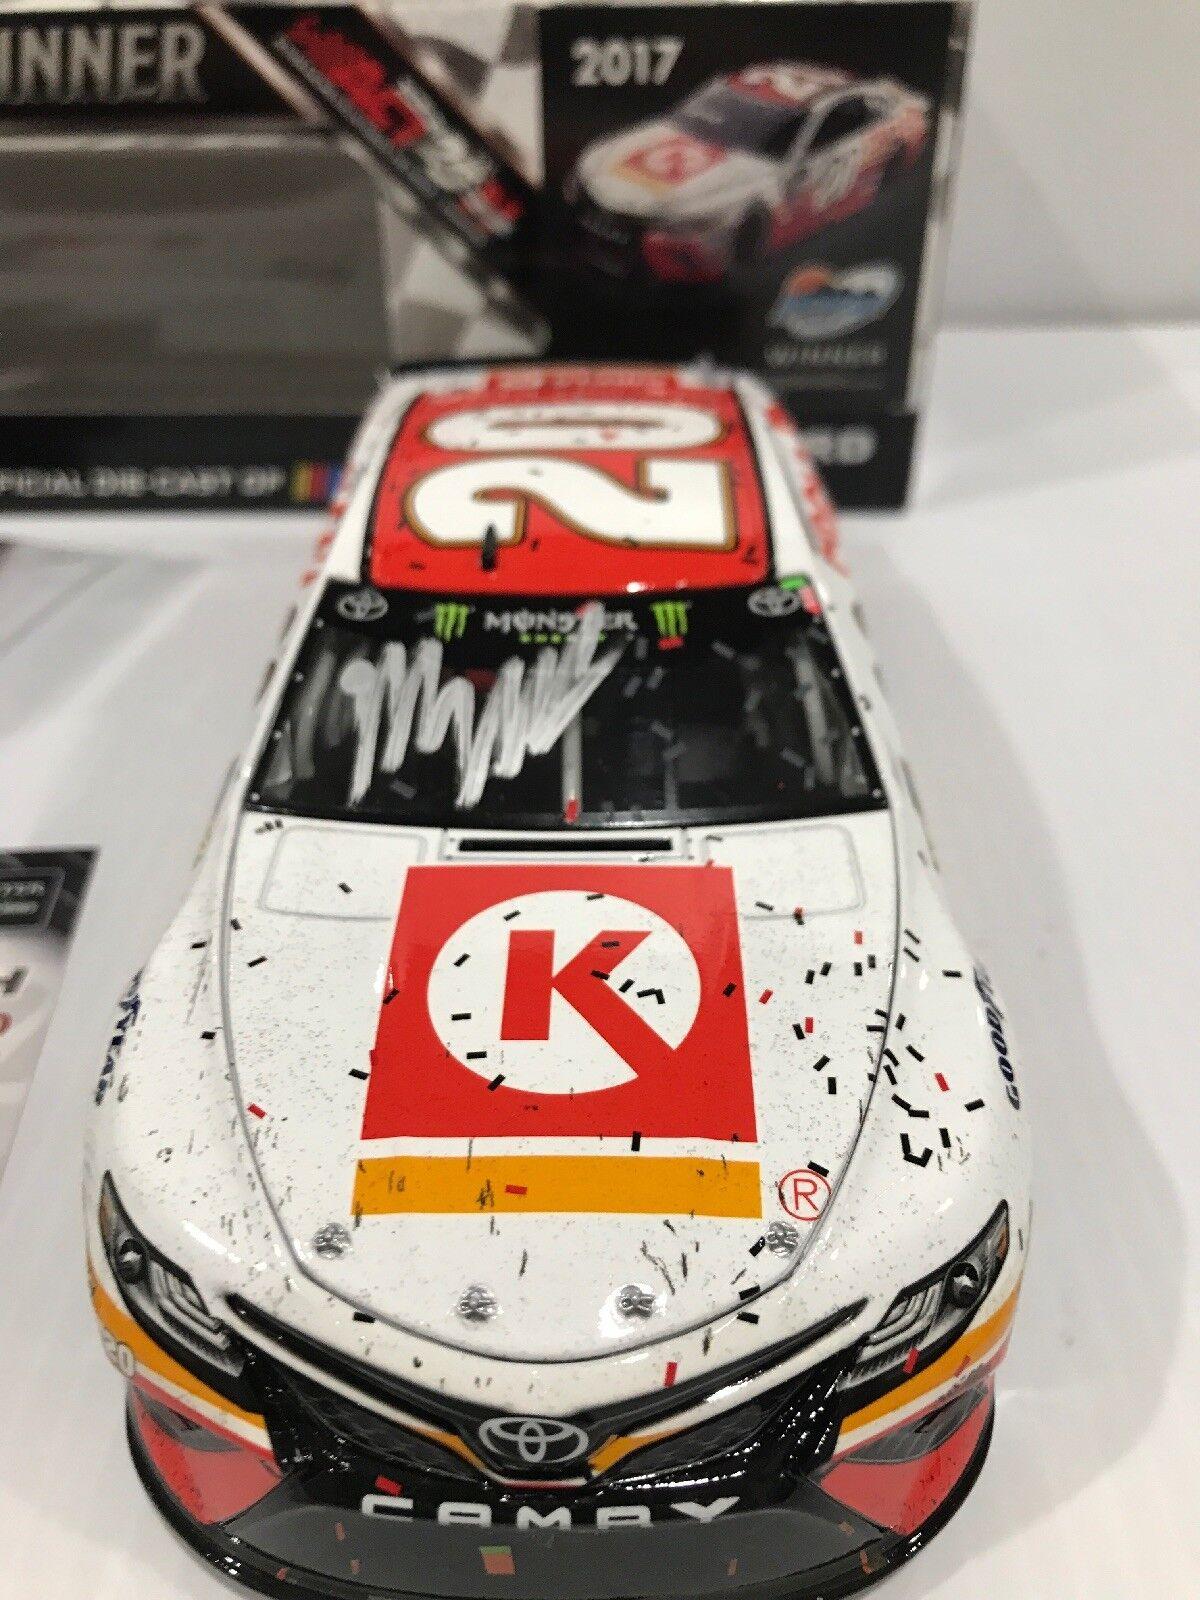 2017_;20 Matt Kenseth Circle K Phoenix Raced Win Autografato